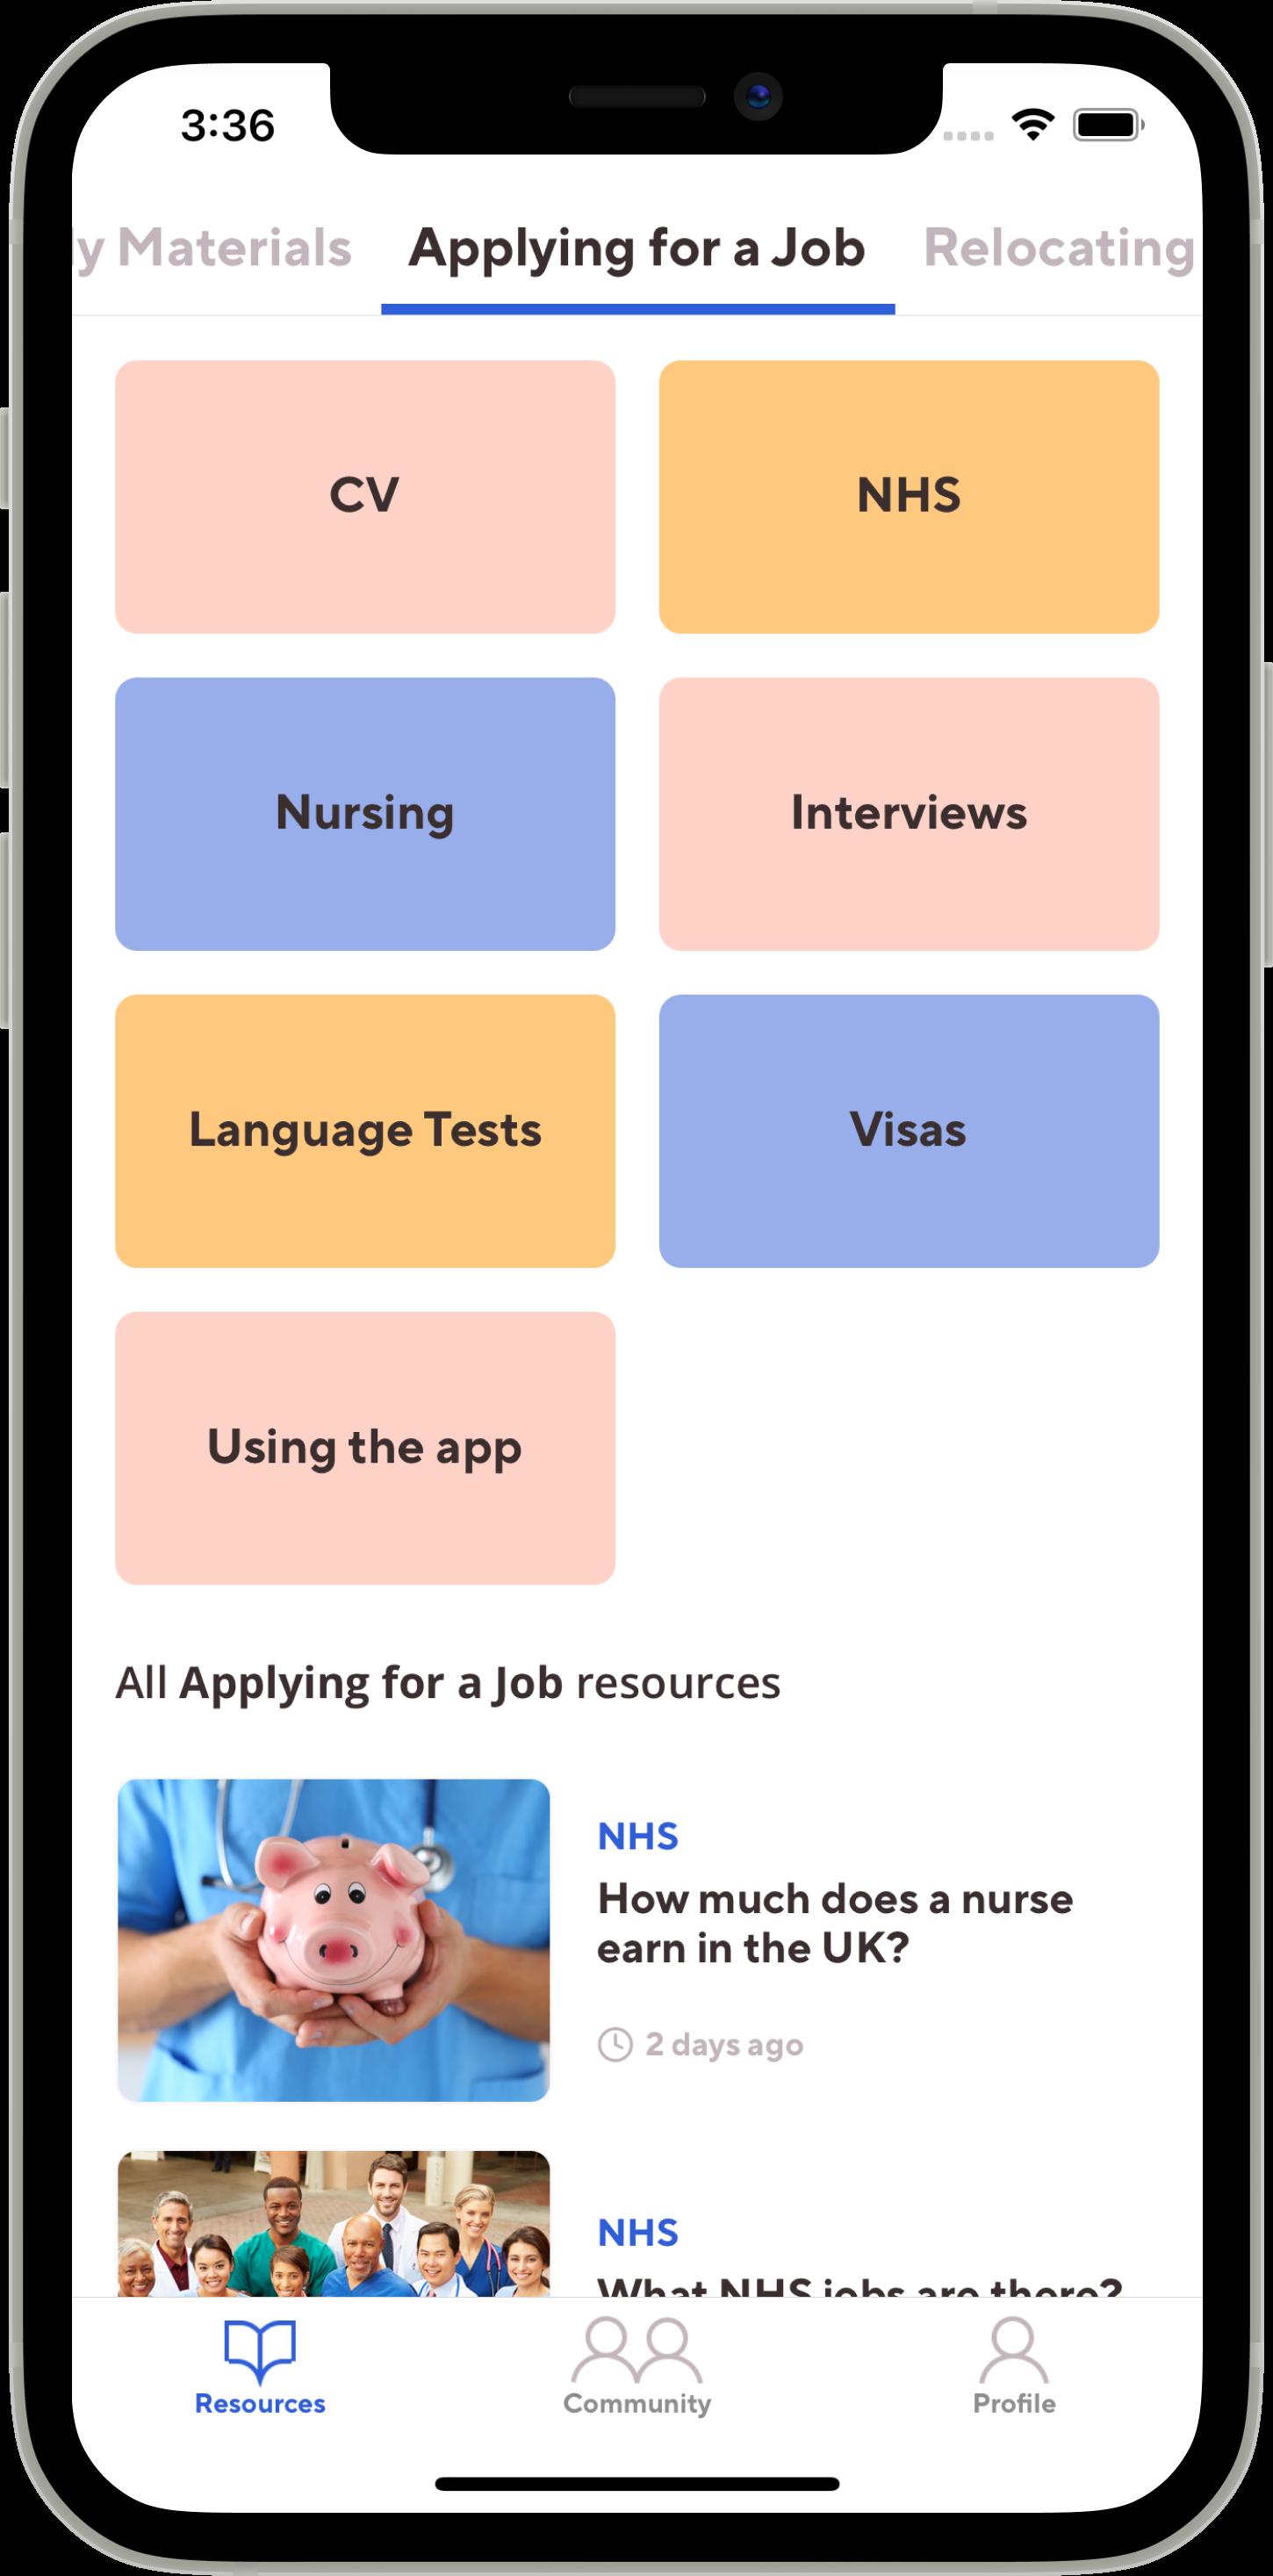 Migrate - The international healthcare recruitment app